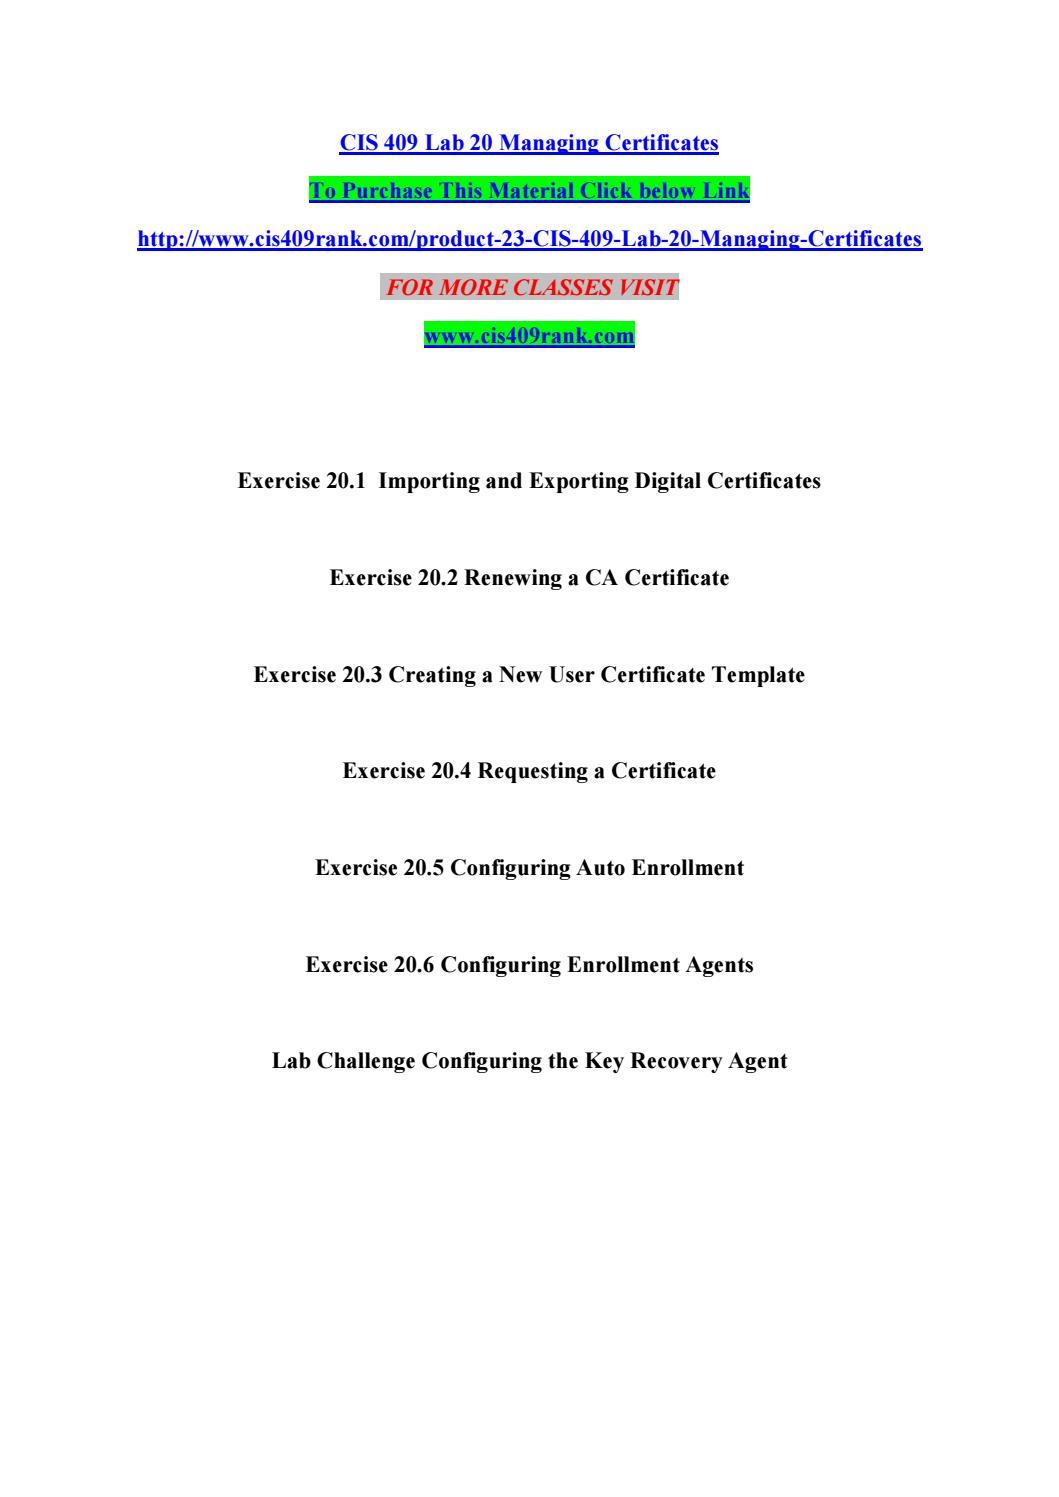 Cis 409 lab 20 managing certificates by manuuu02 - issuu